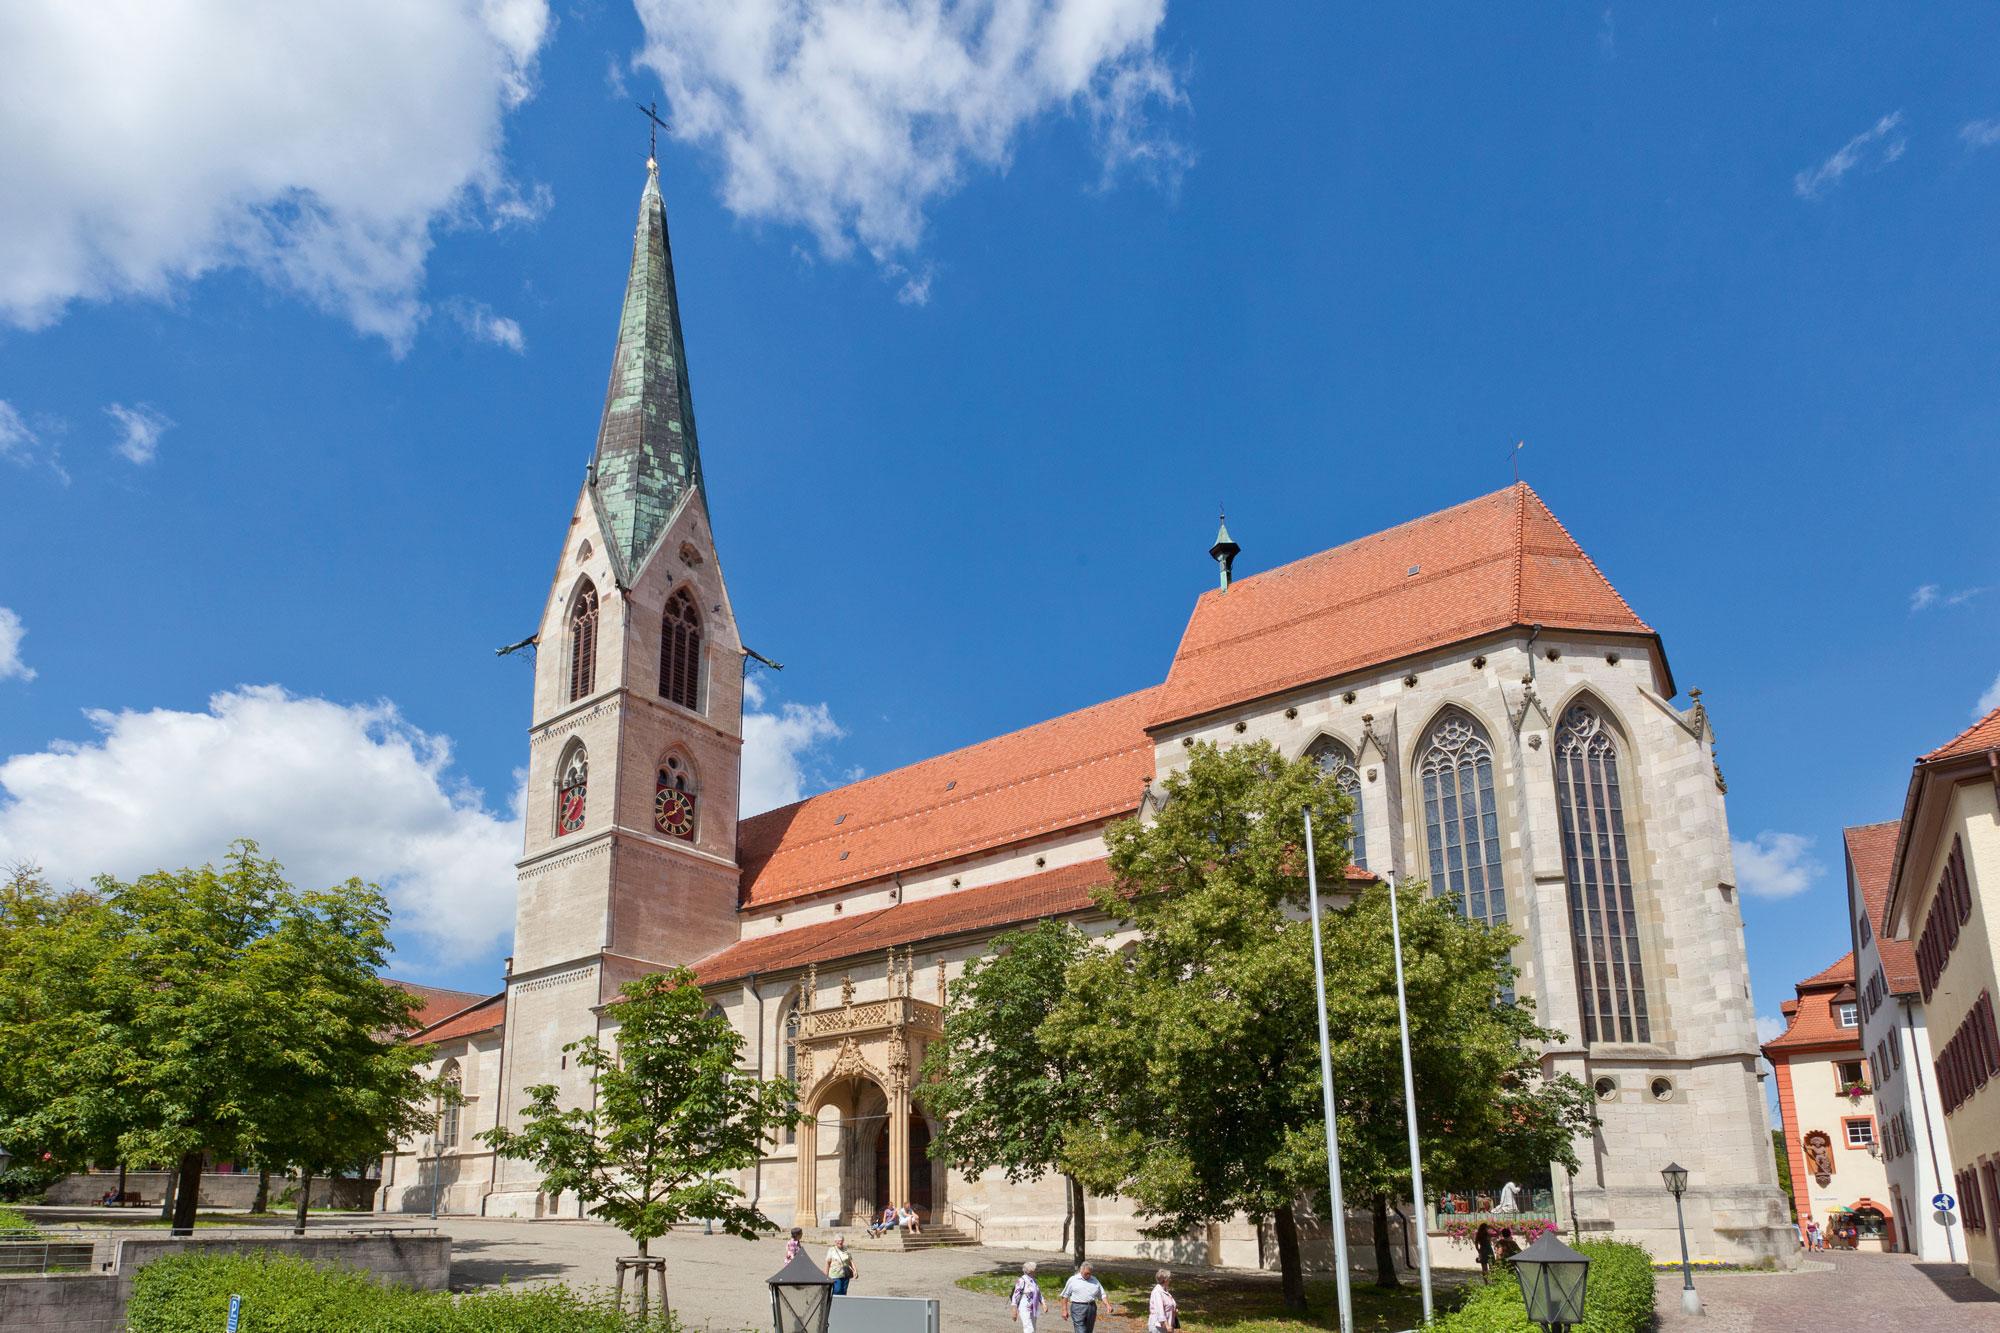 Südseite des Heilig-Kreuz-Münsters